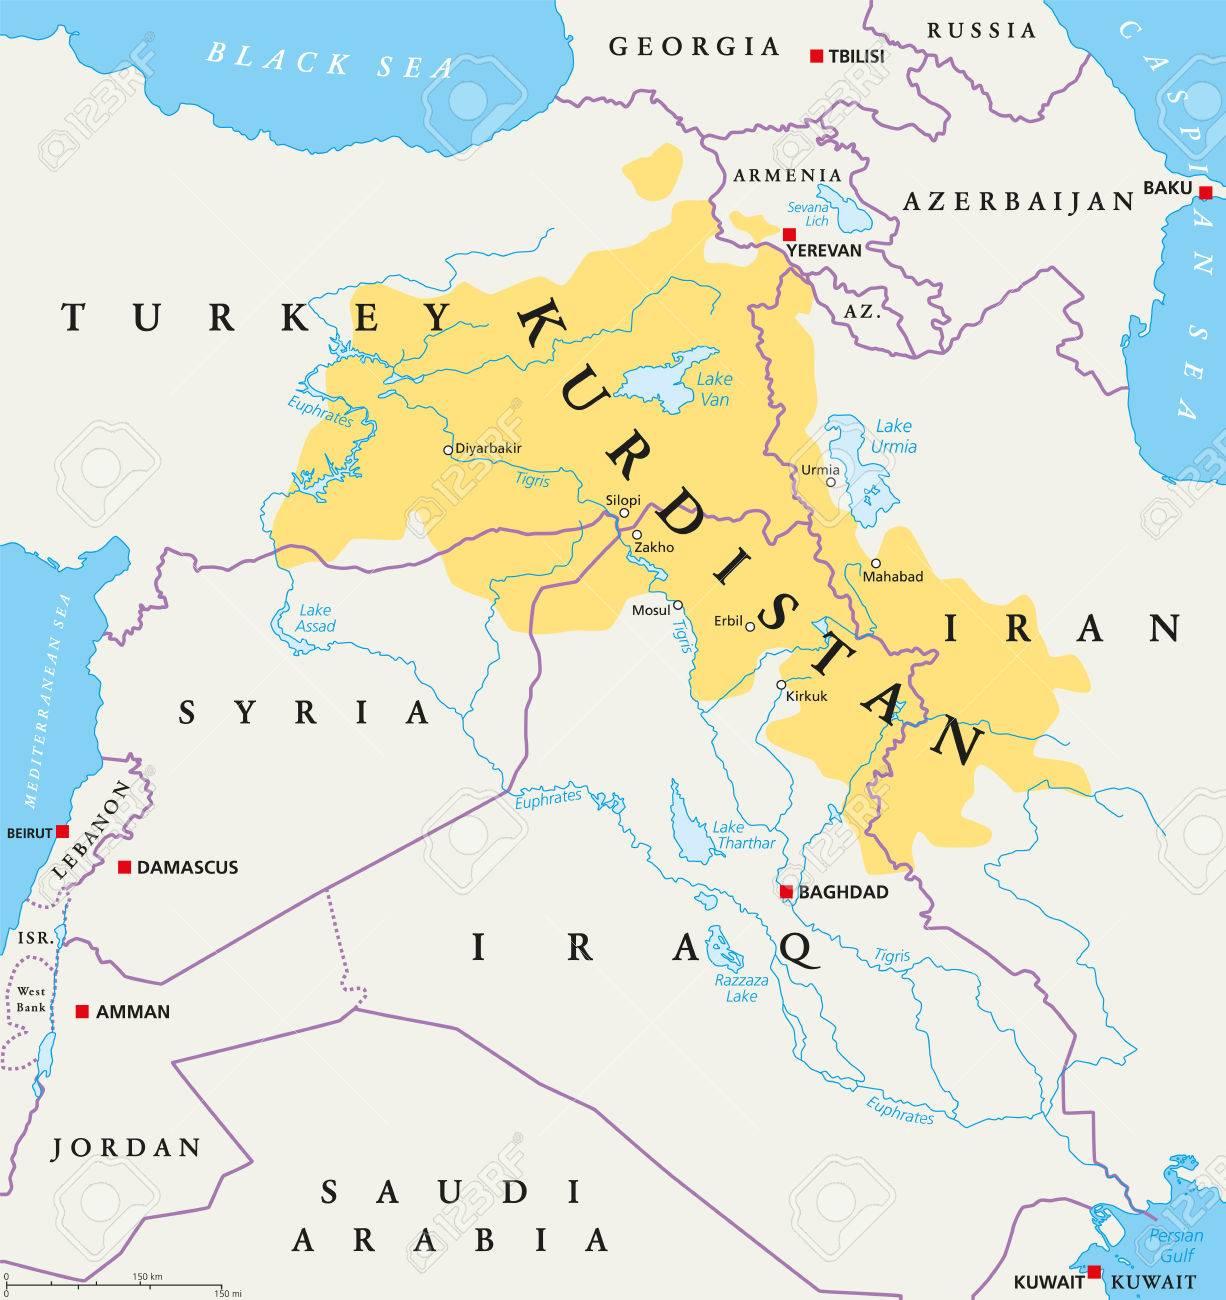 Kurdistan, Kurdish lands political map. Cultural region wherein.. on dead sea map, chechnya map, kashmir map, erbil map, kyrgyzstan map, baluchistan map, lebanon map, iraqi kurdistan, uzbekistan map, assyria map, kurdish population map, kurdish language, ukraine map, kurdish jews, turkish kurdistan, iraq map, afghanistan map, iranian kurdistan, halabja poison gas attack, kurdistan province, kurdish people, turkey map, kuwait map, baghdad map, kurdish flag, south ossetia map, palestine map, zagros mountains, persian people, iran map, scotland map,